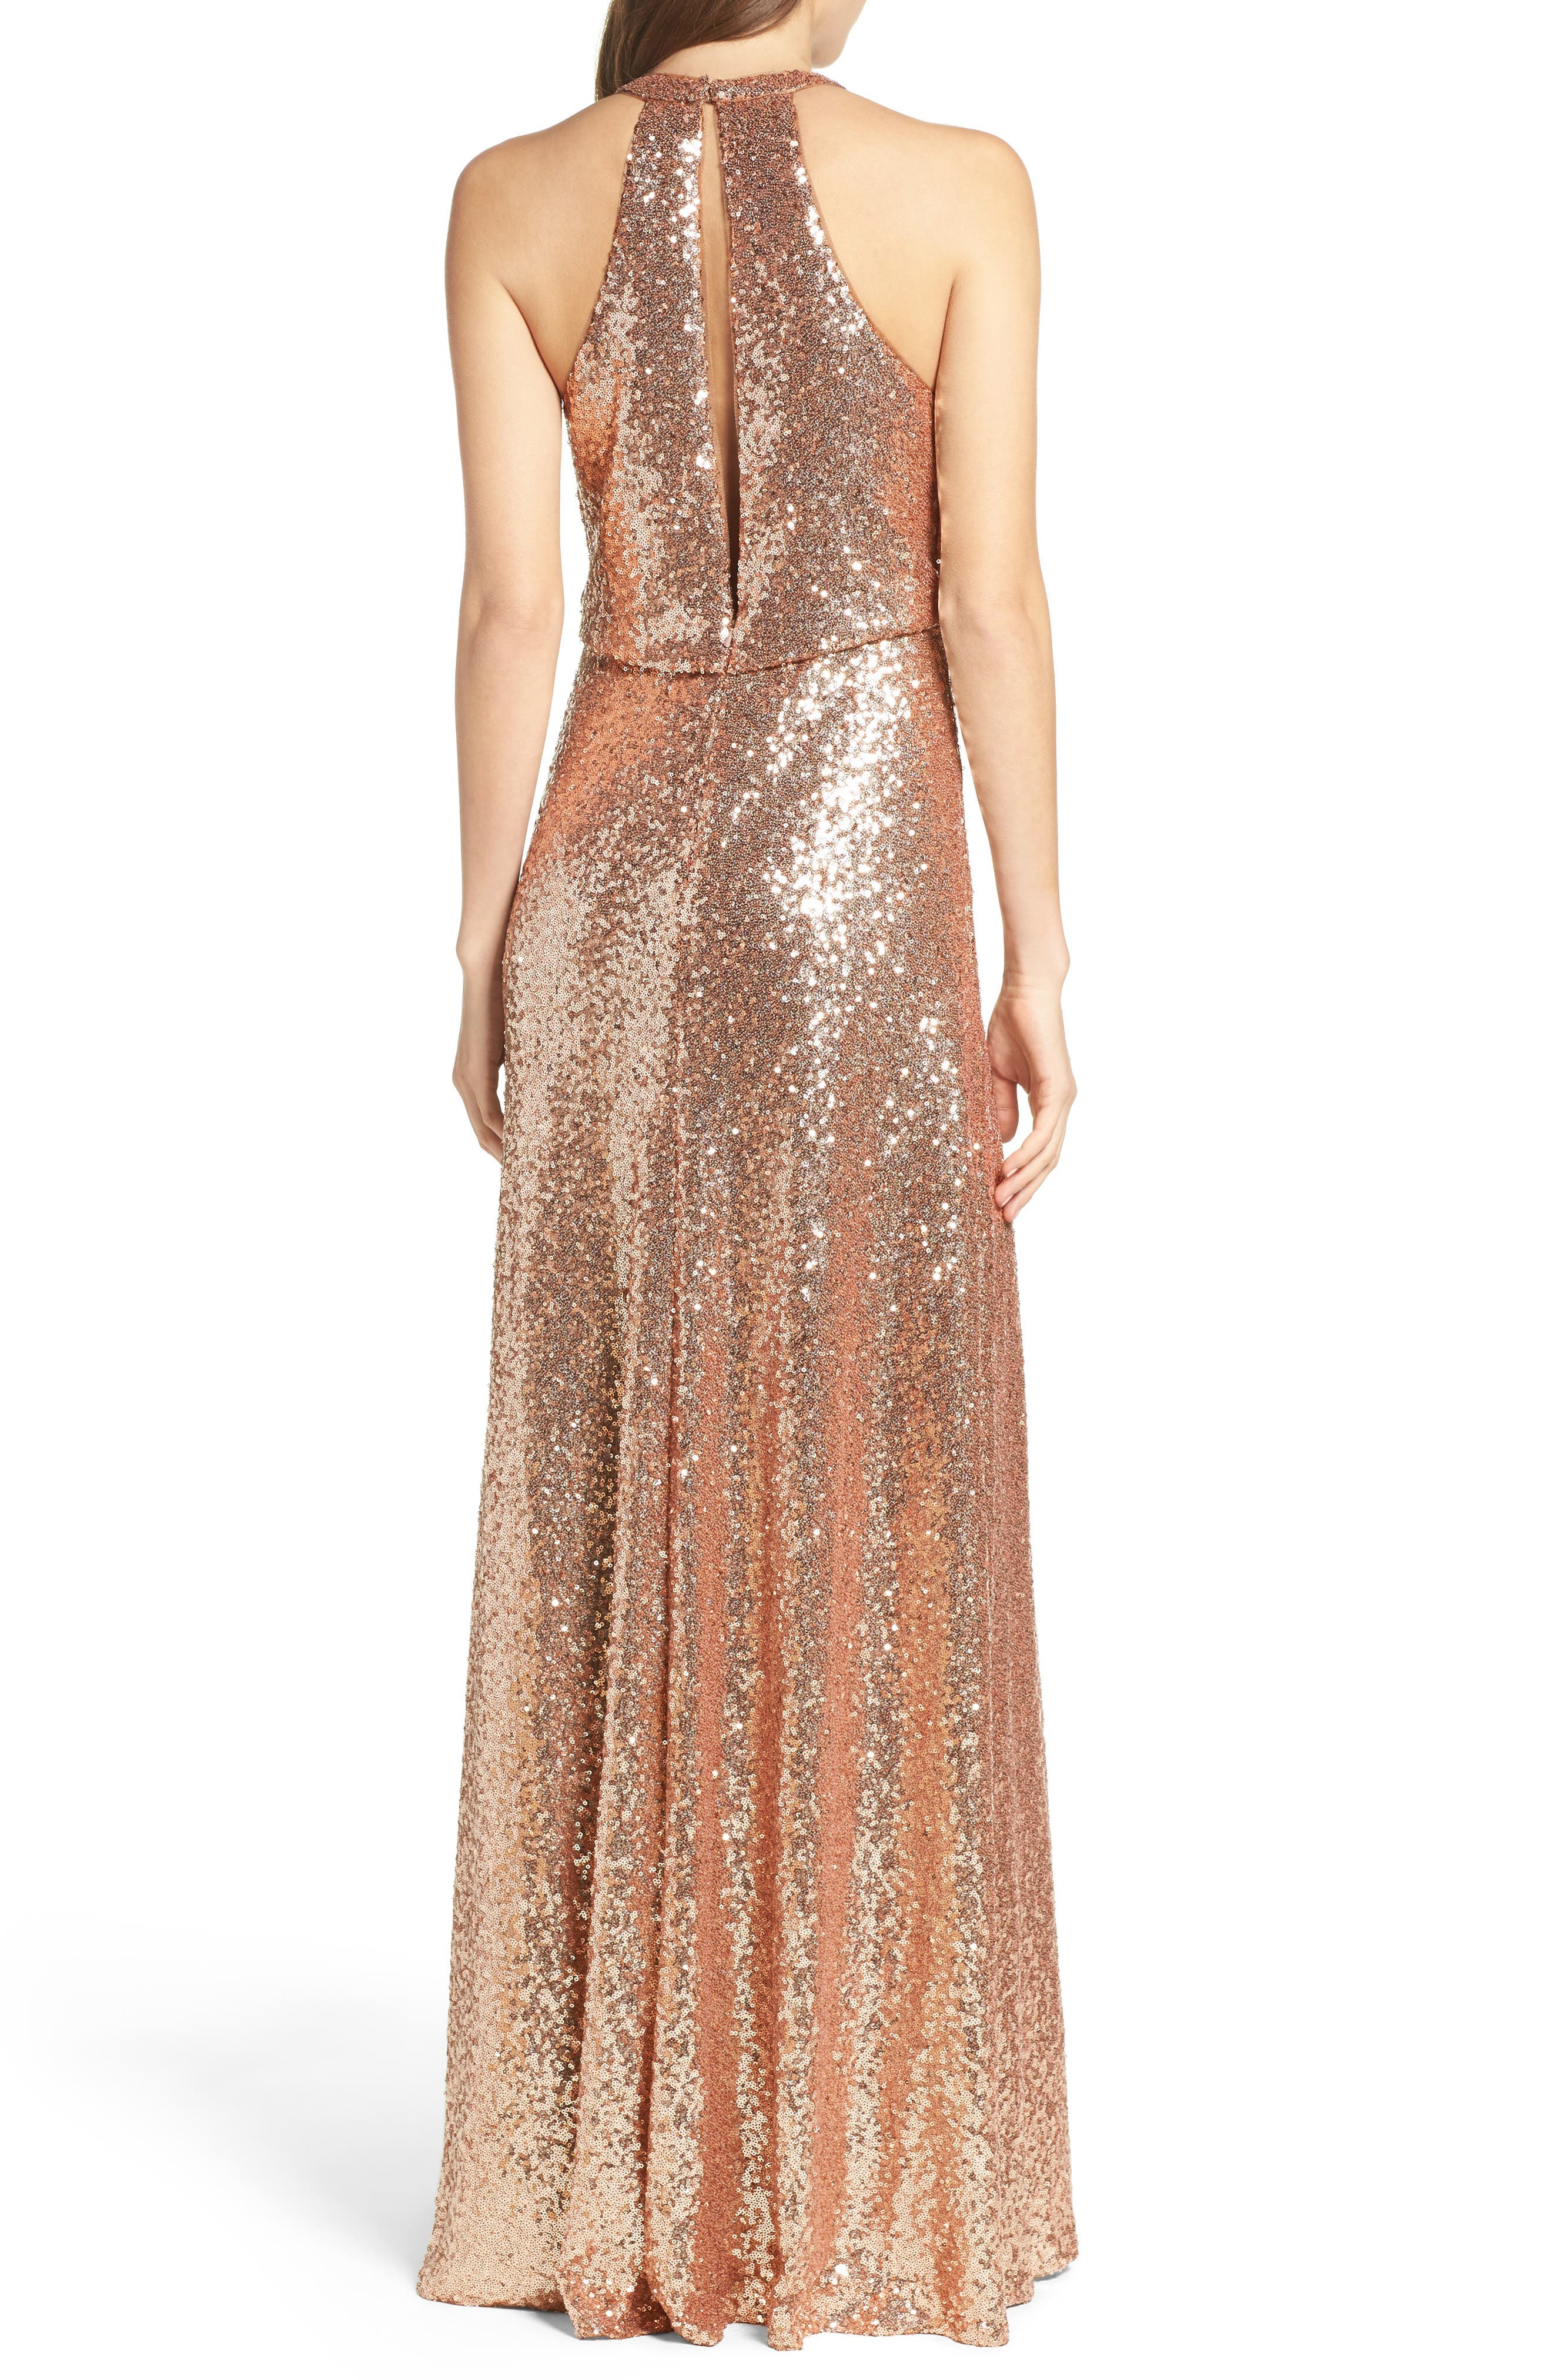 Sloane Sequin Halter Gown,                             Alternate thumbnail 2, color,                             Rose Gold